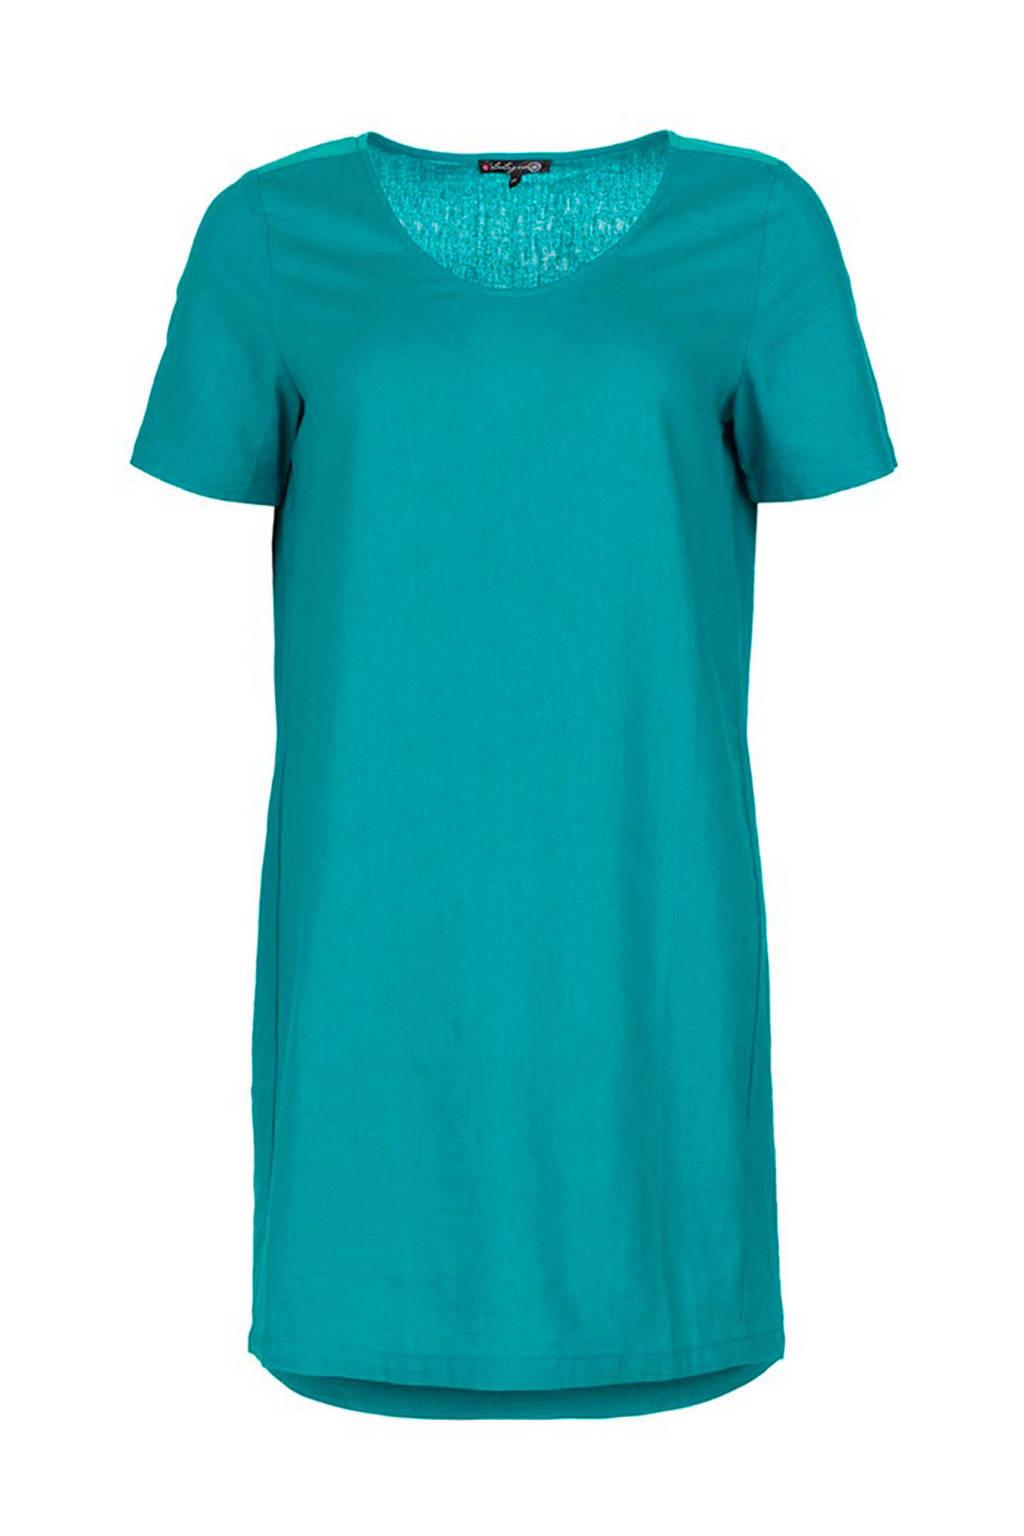 La Ligna jurk met linnen turquoise, Turquoise